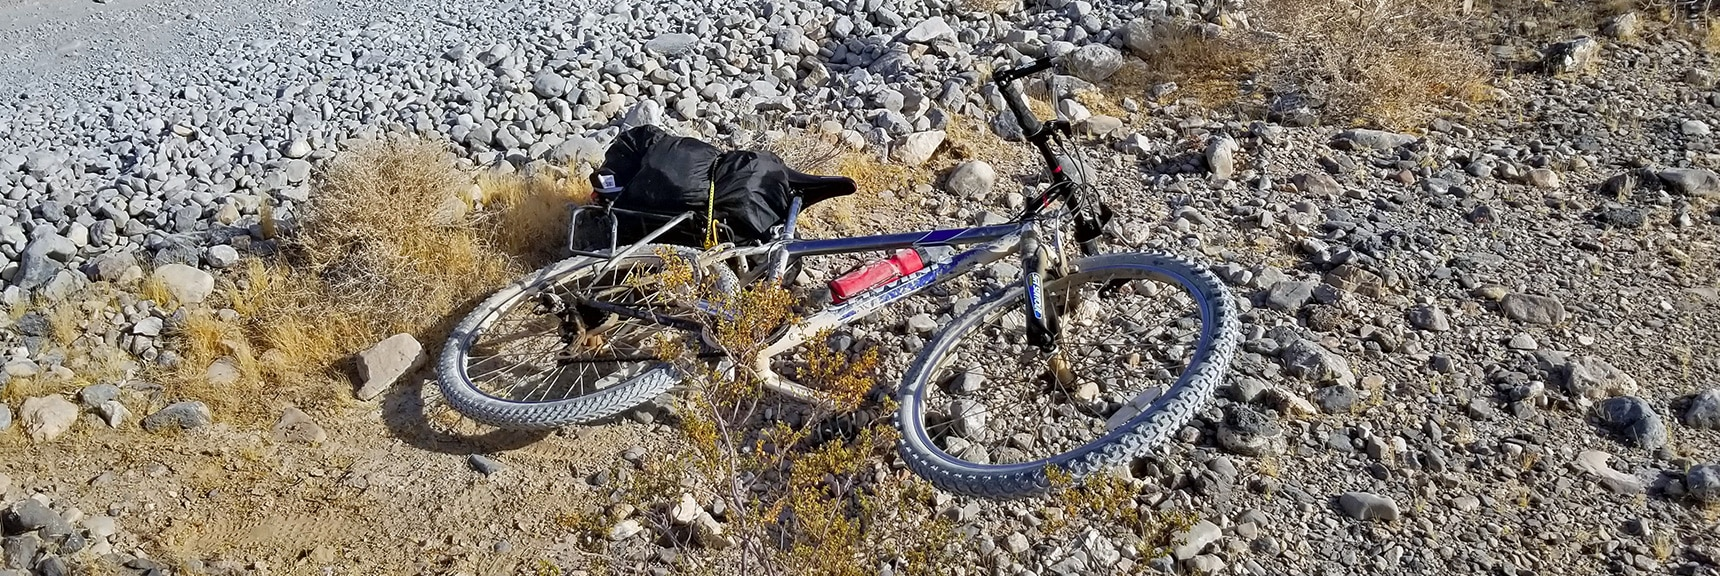 Pausing to View the Sheep Range, Gass Peak, Spring Mts. and La Madre Mts. | Smart Car Bike Rack and Mountain Bike Test, Sheep Range, Nevada